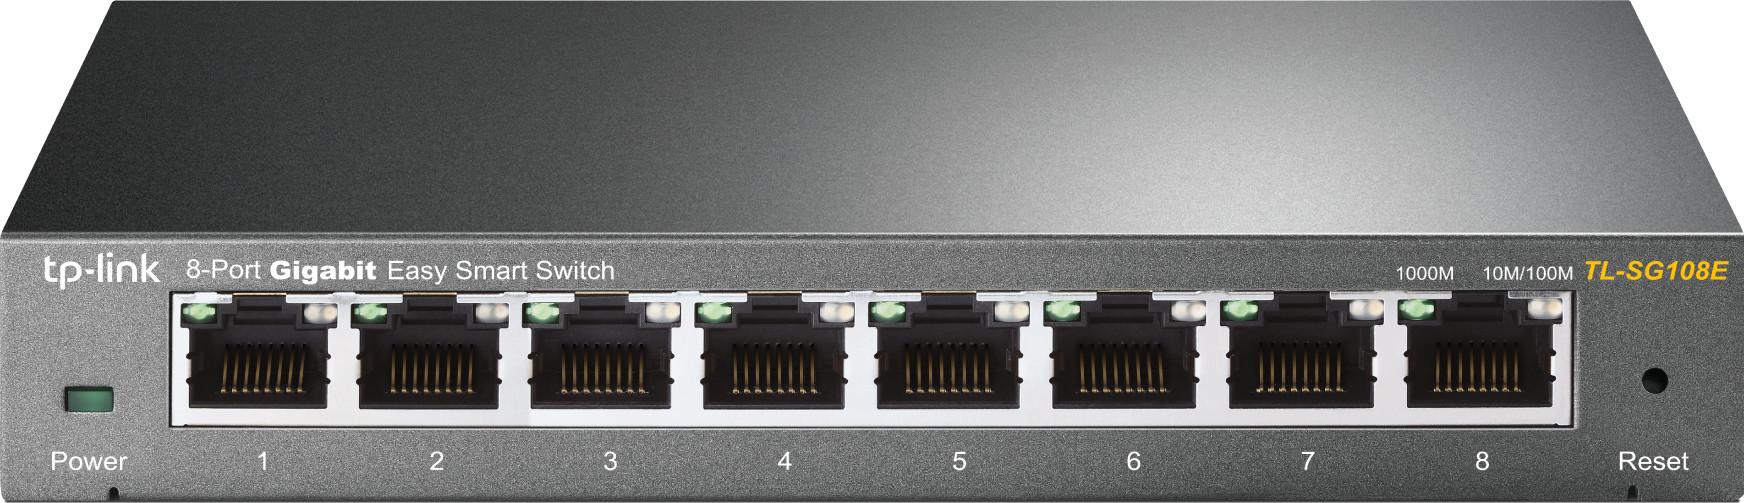 Tp link netwerk switch TL SG108E